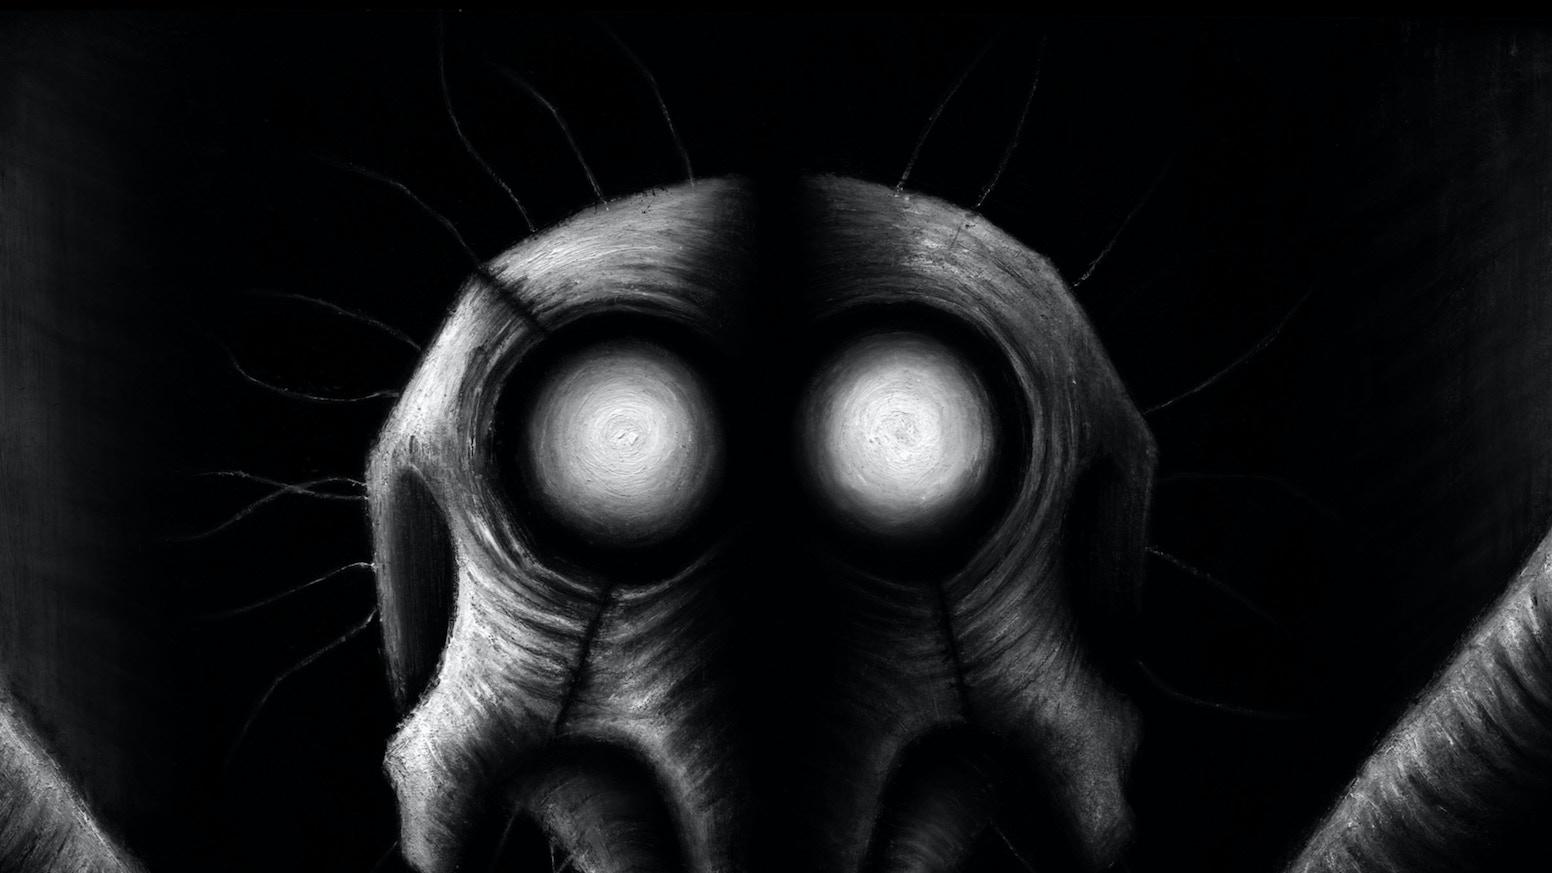 Some Nightmares Breathe.